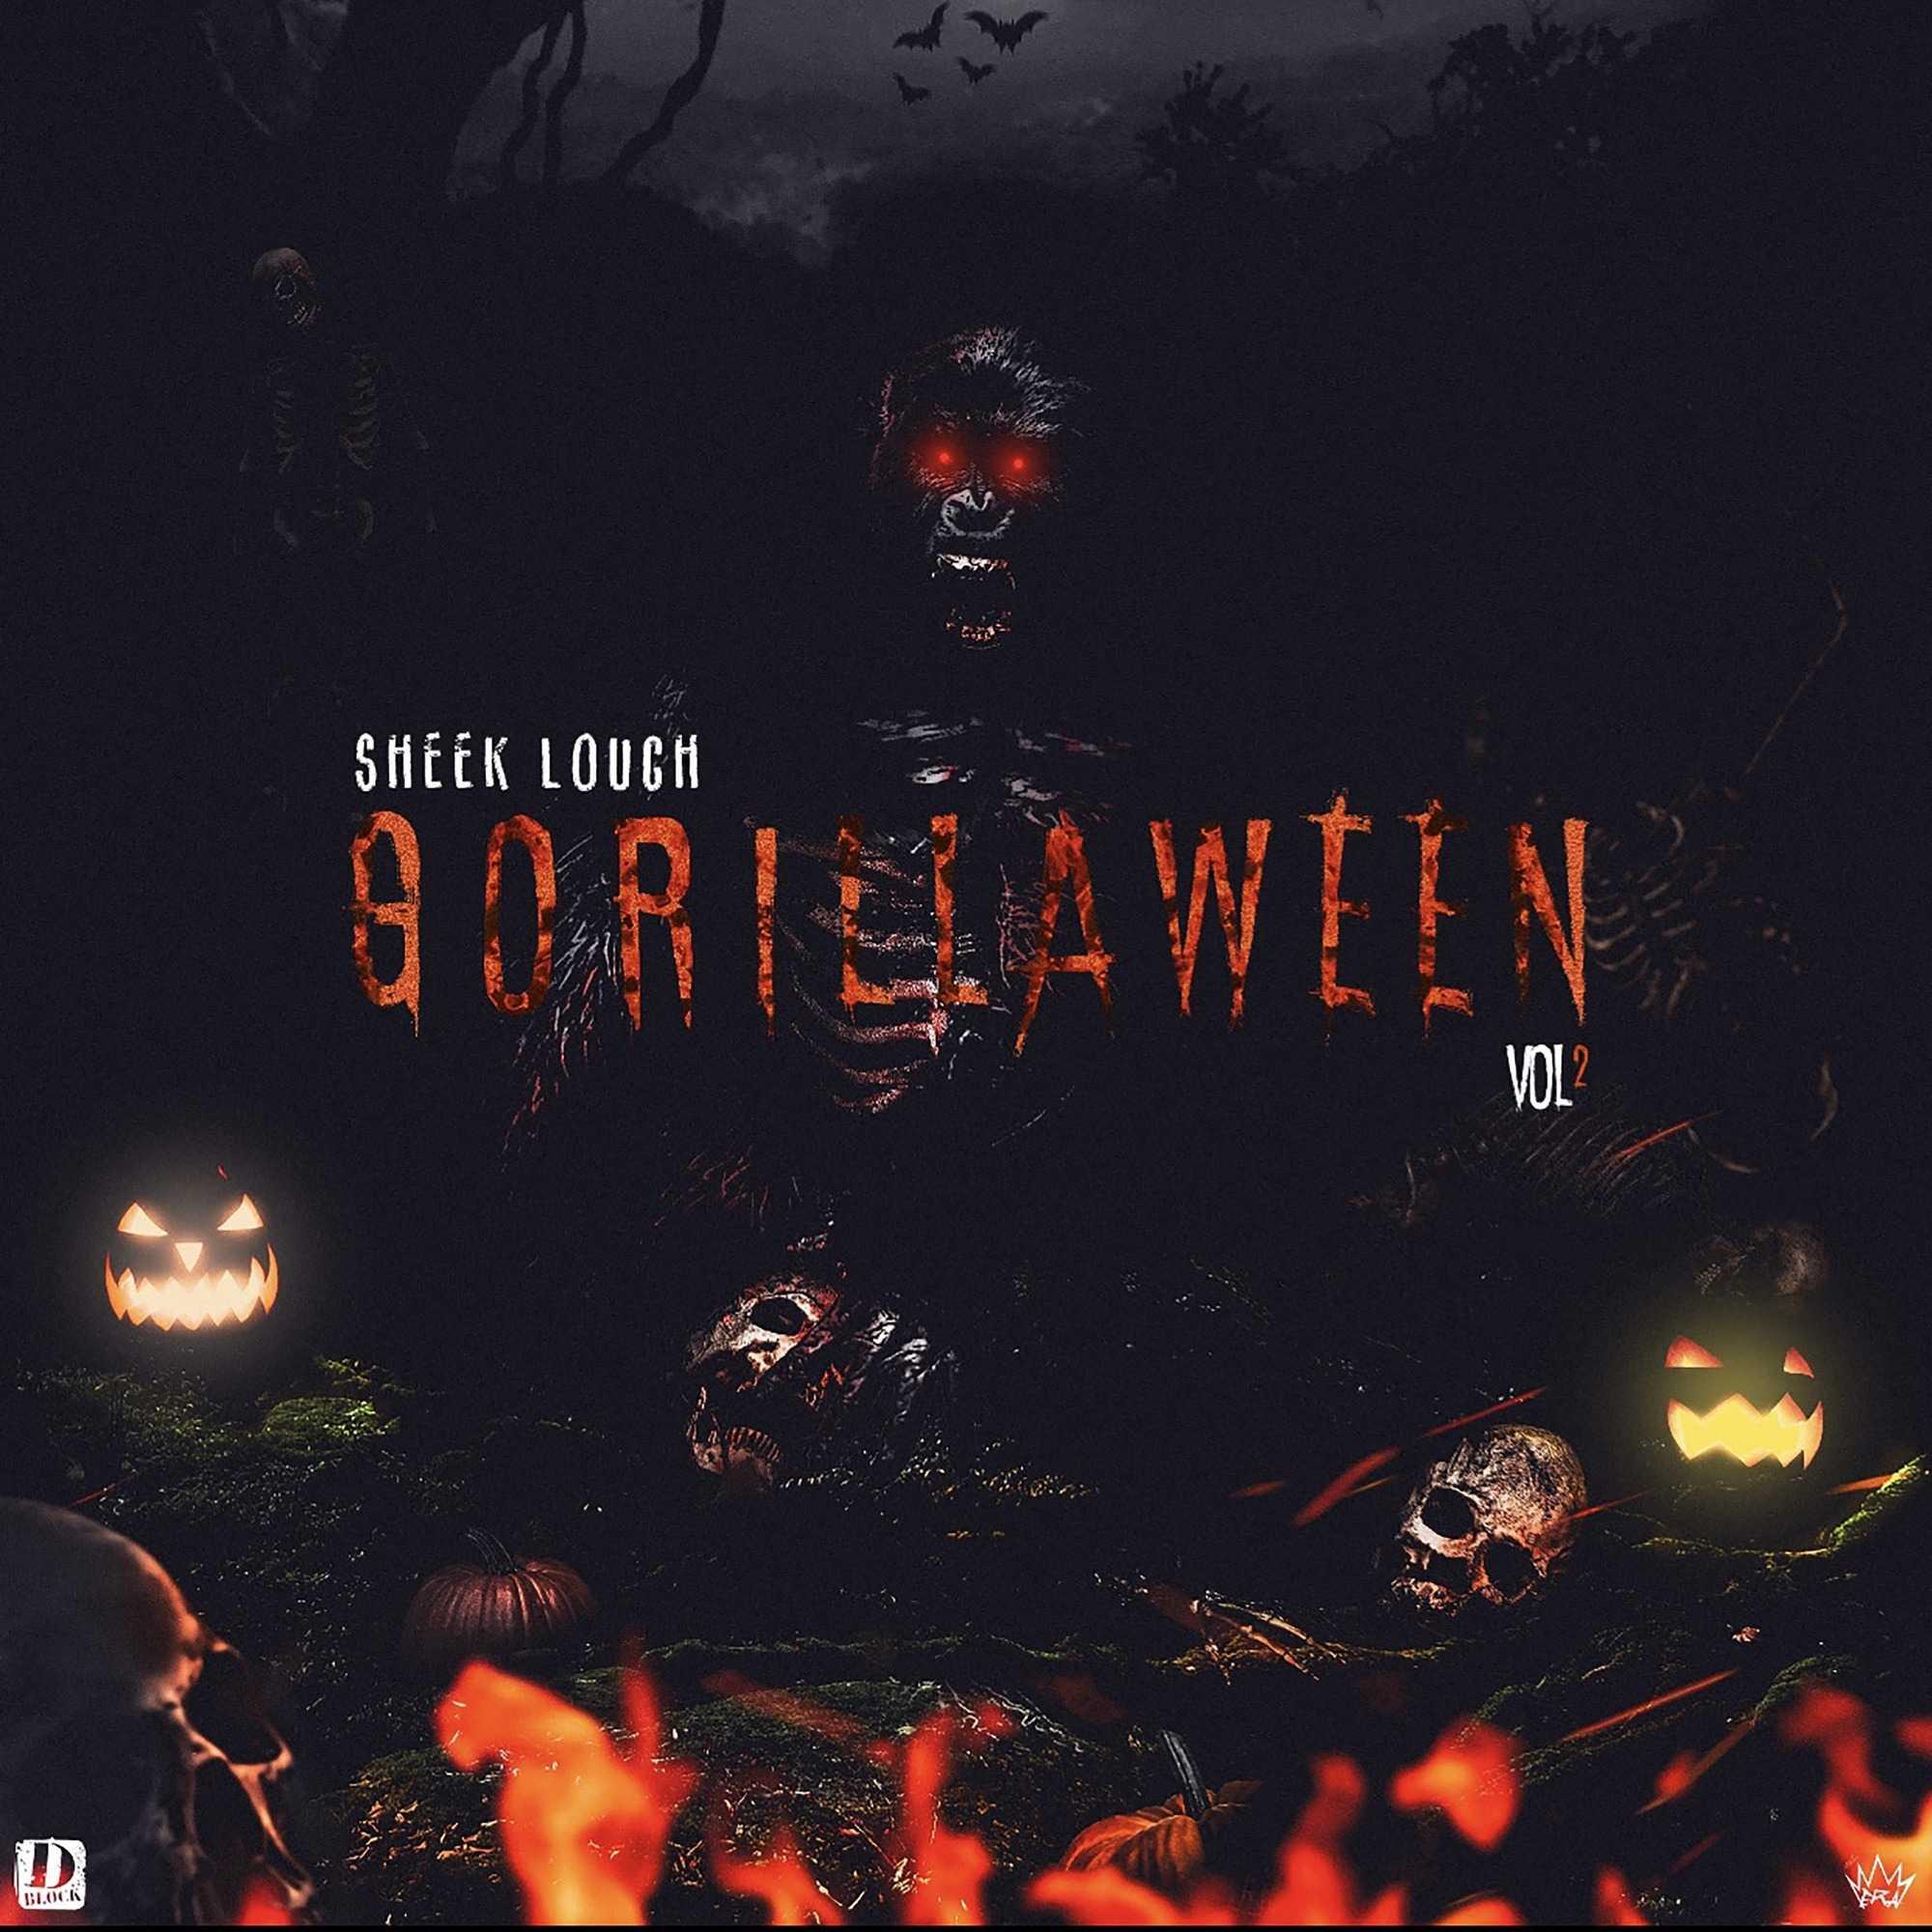 Sheek Louch – Gorillaween, Vol. 2 [Audio]